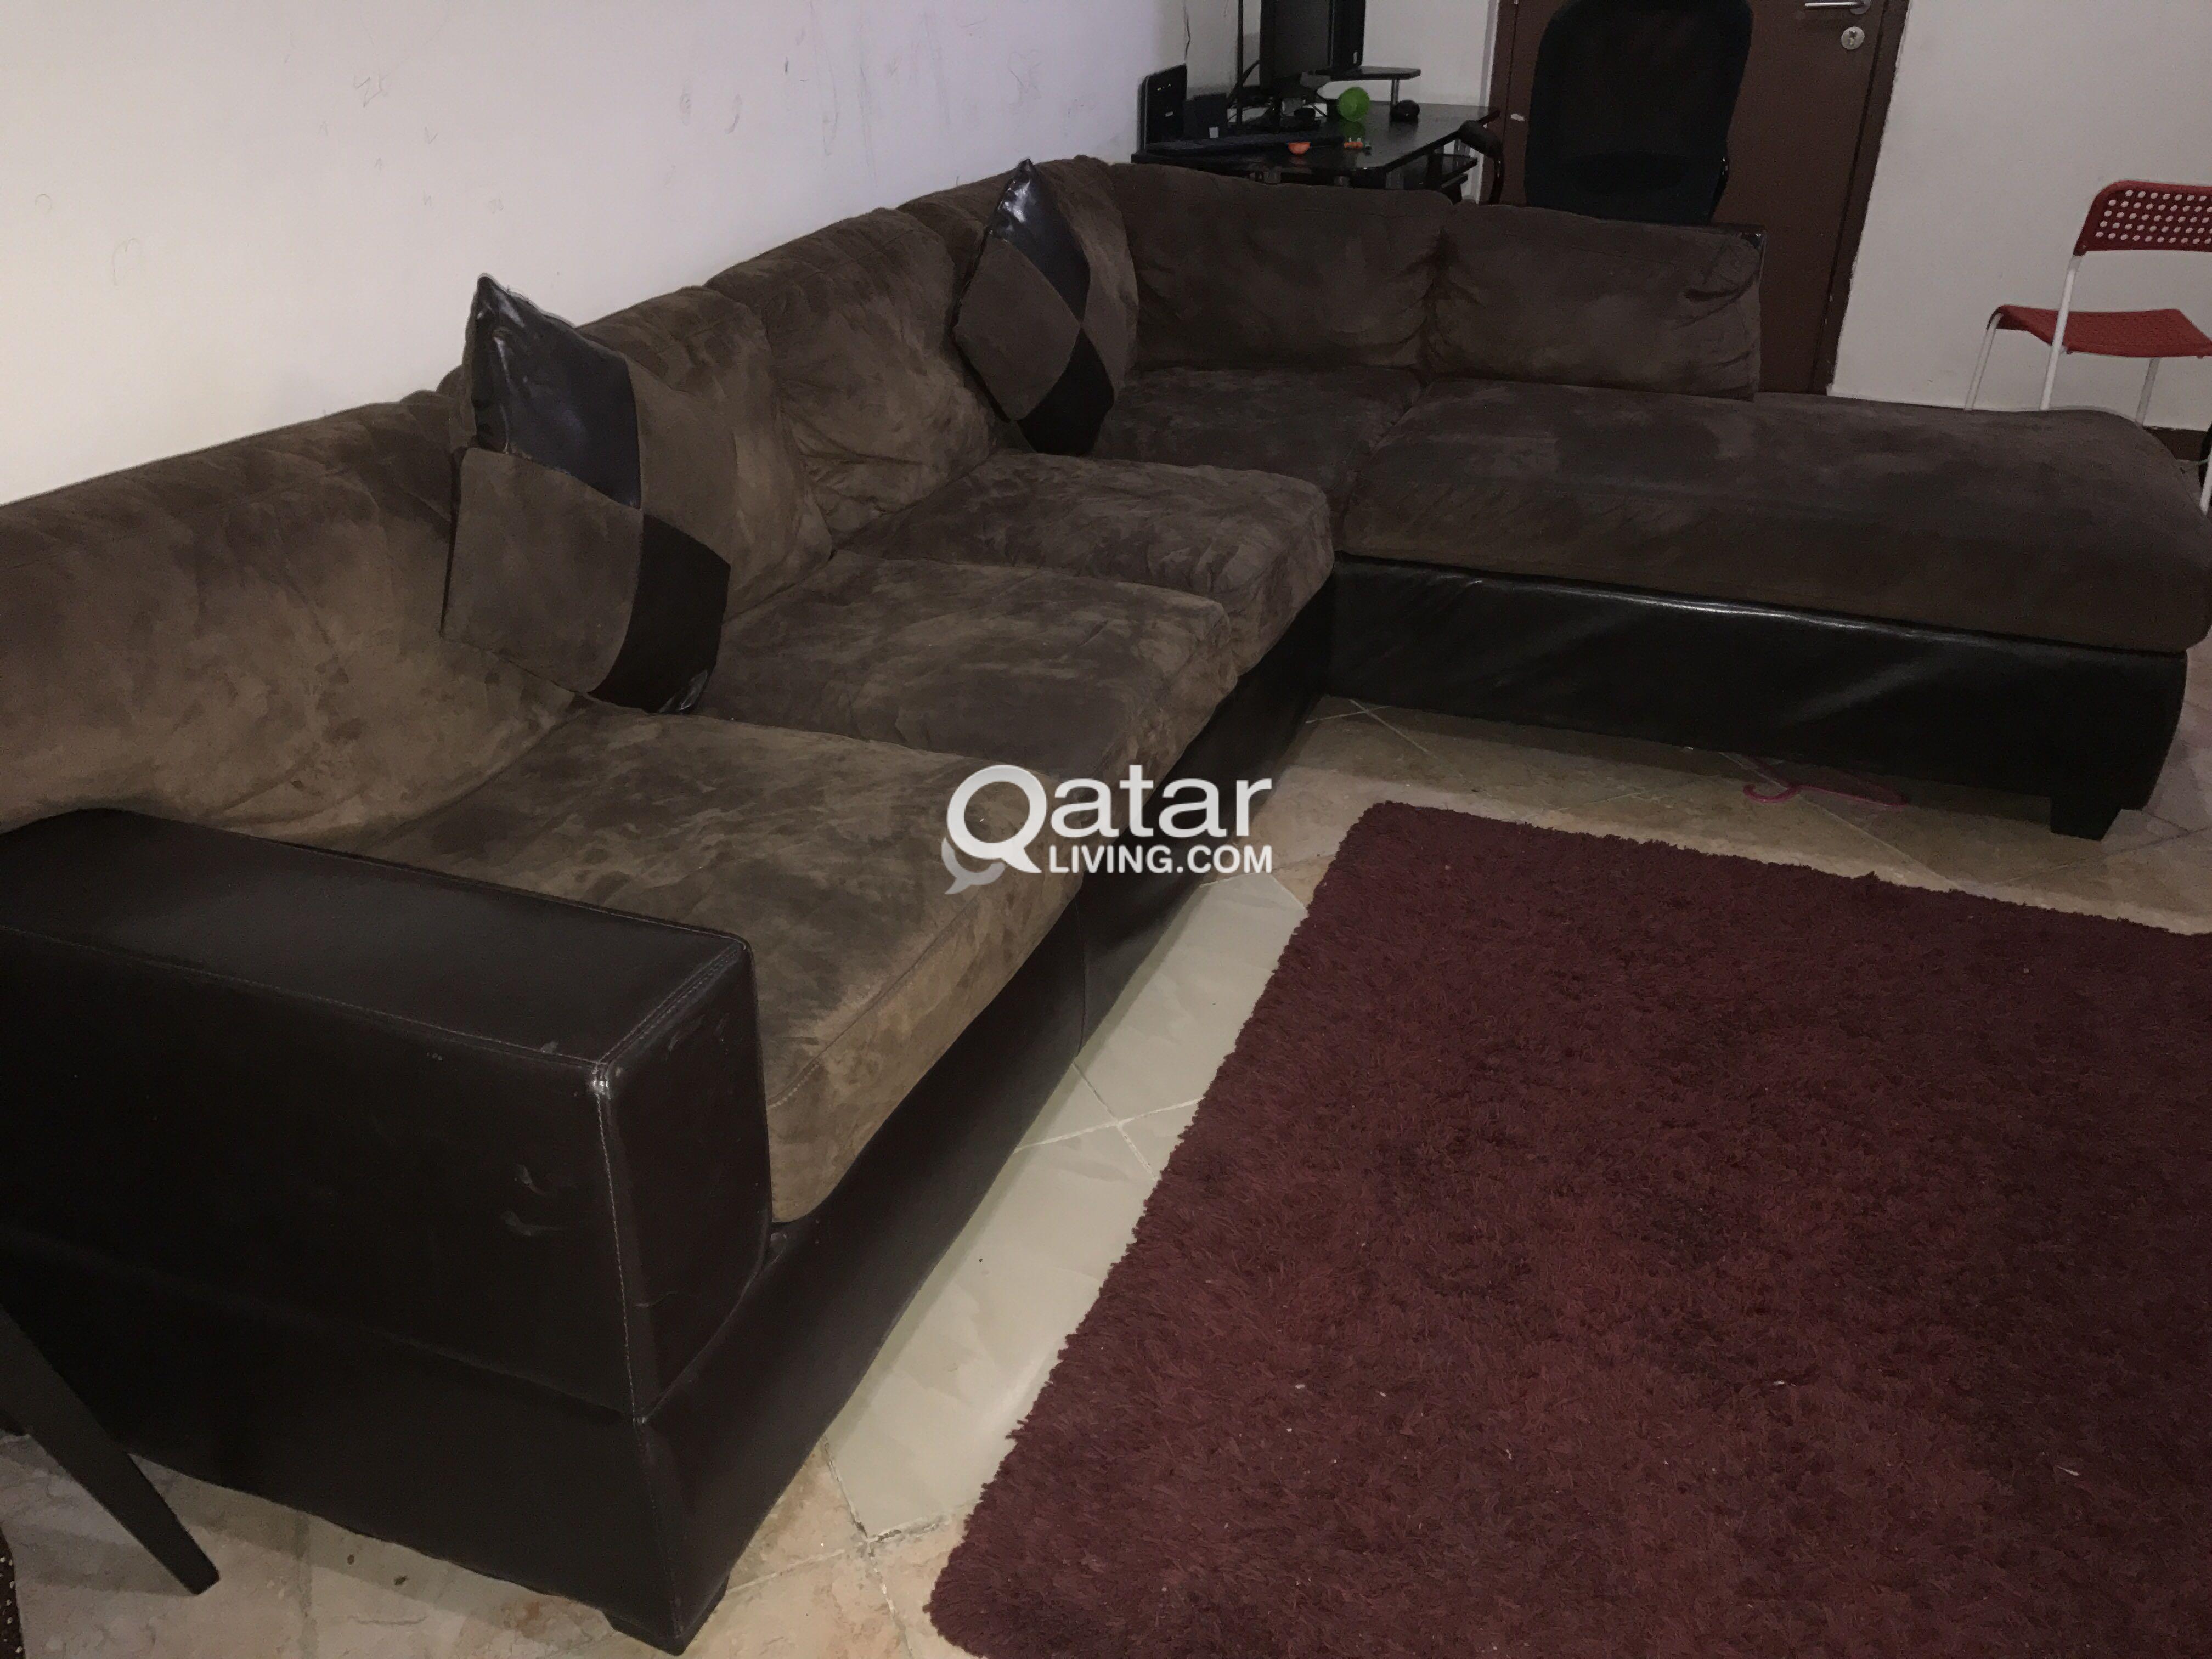 home center l shape sofa for sale | qatar living